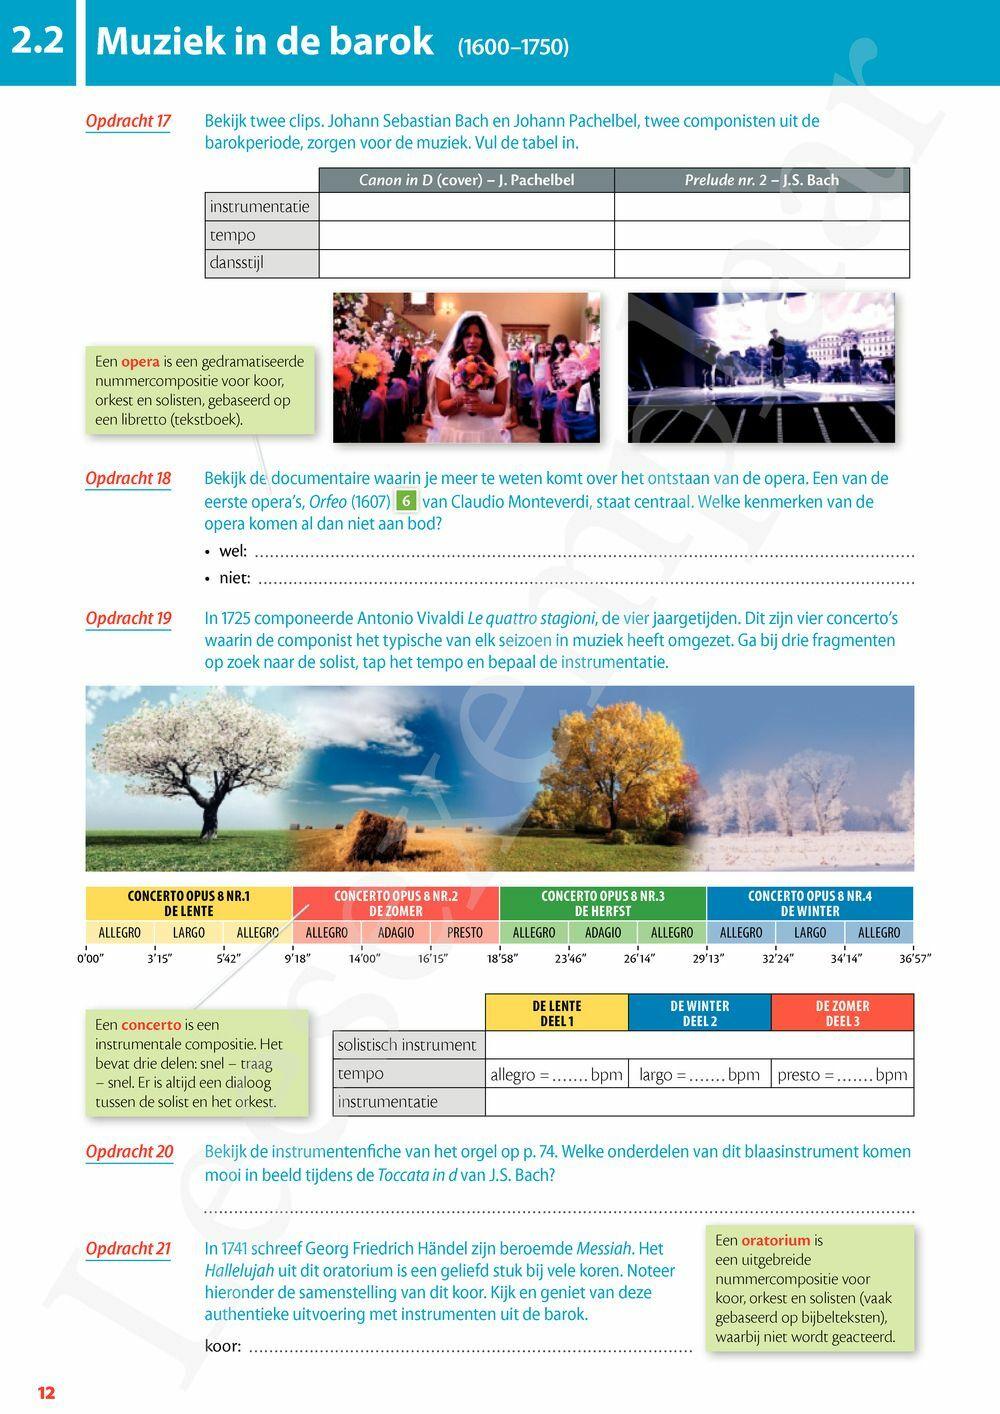 Preview: Boost! tweede graad leerwerkboek inclusief dossier (editie 2018)